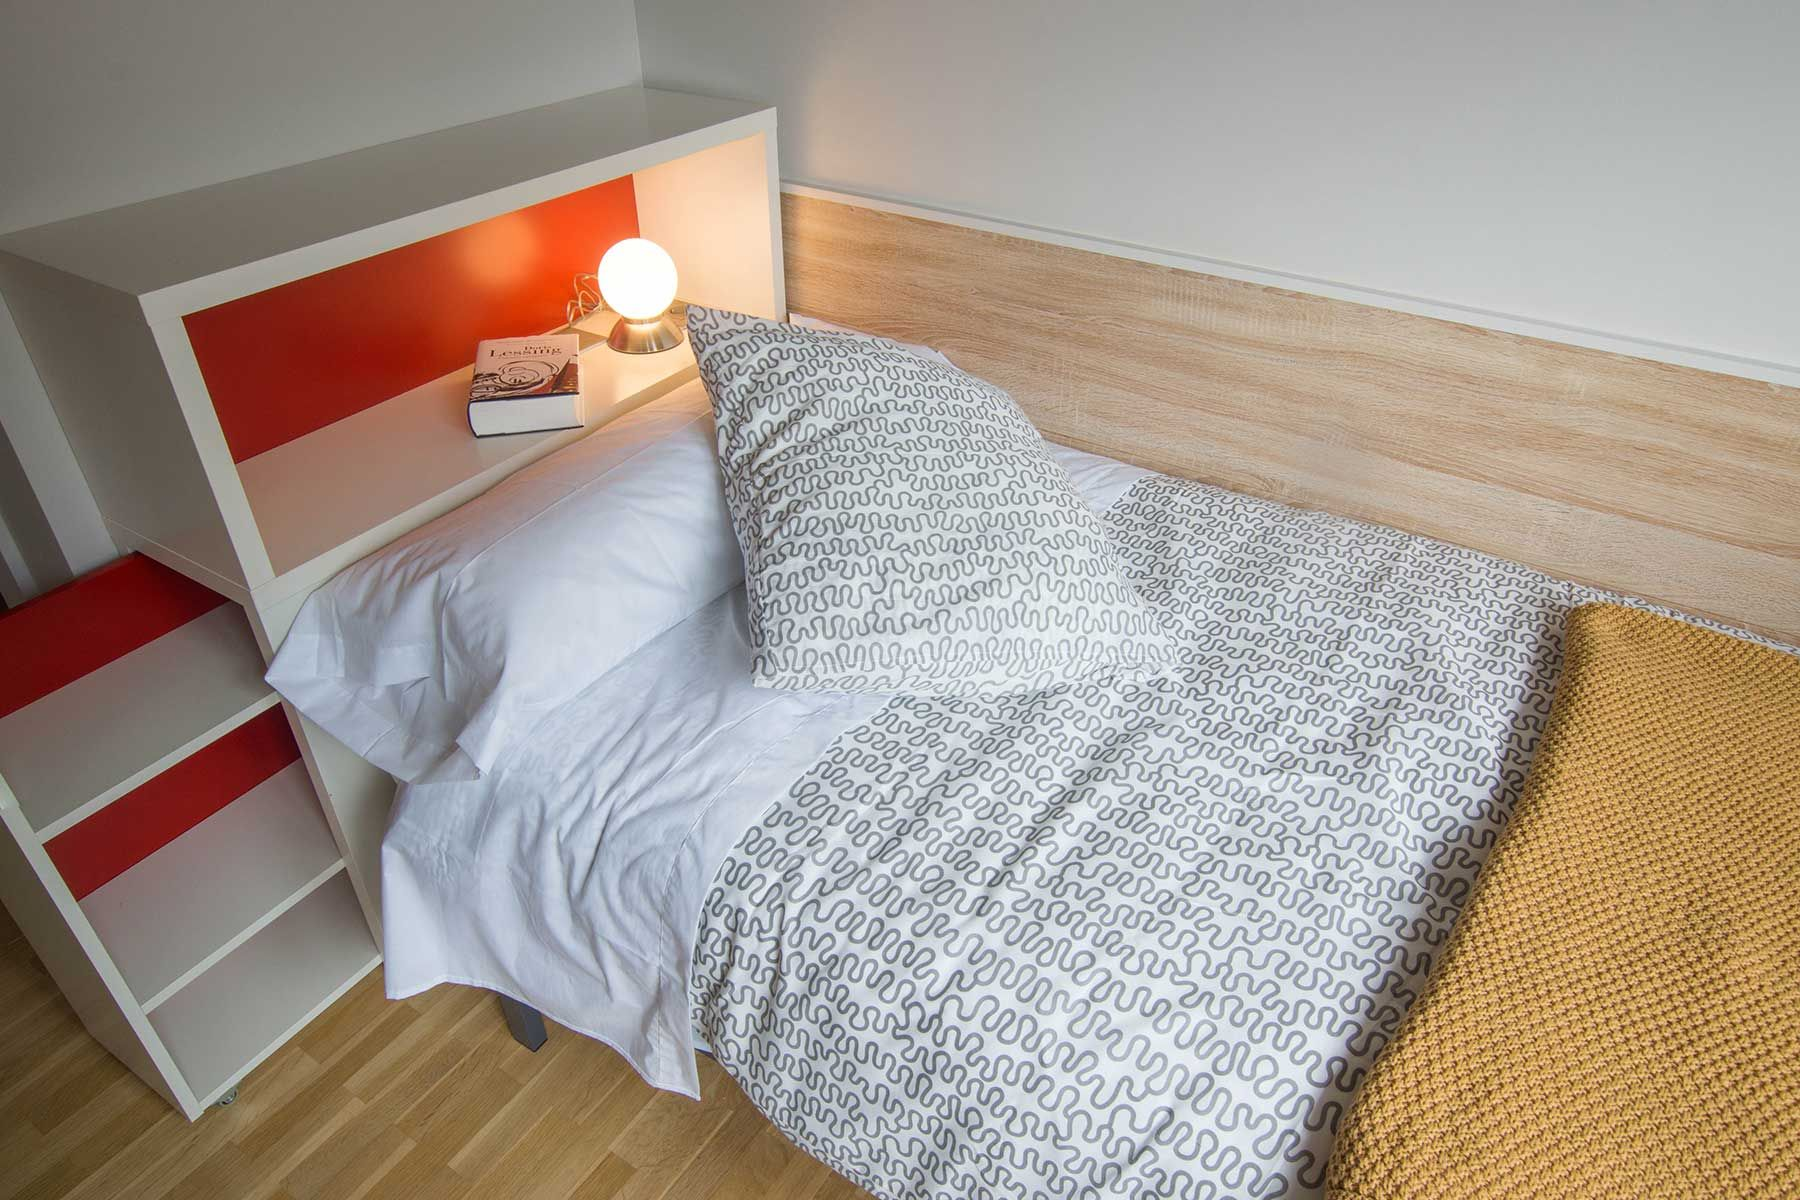 www.casalarraina.com Dormitorio 4, detalle.